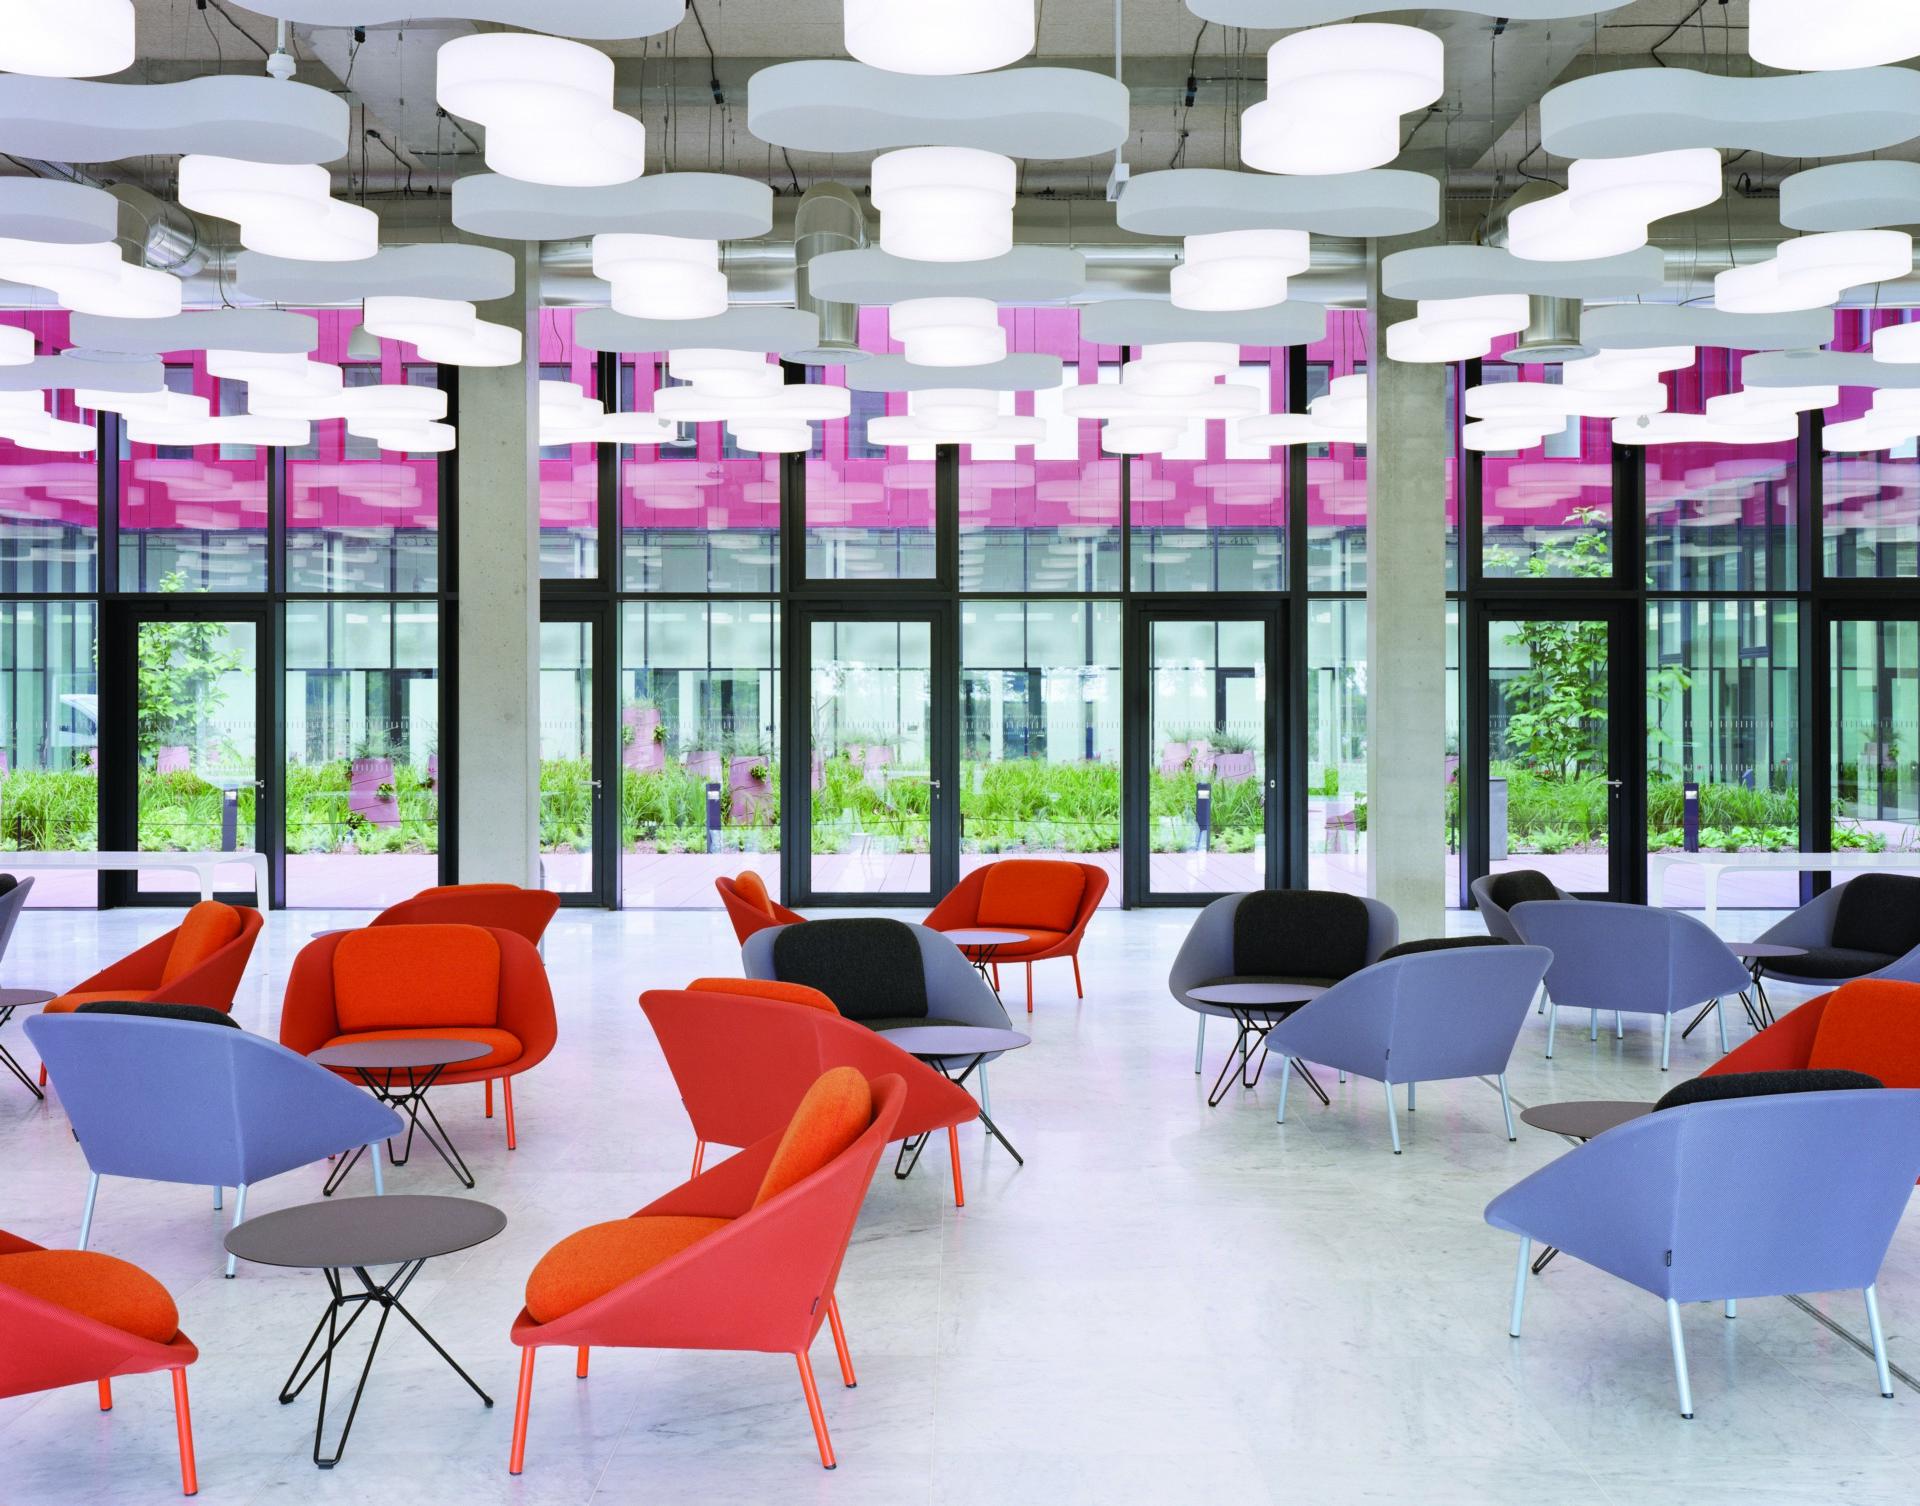 ECDM EDF Campus - Plateau de Paris – Saclay: serendipity in architecture